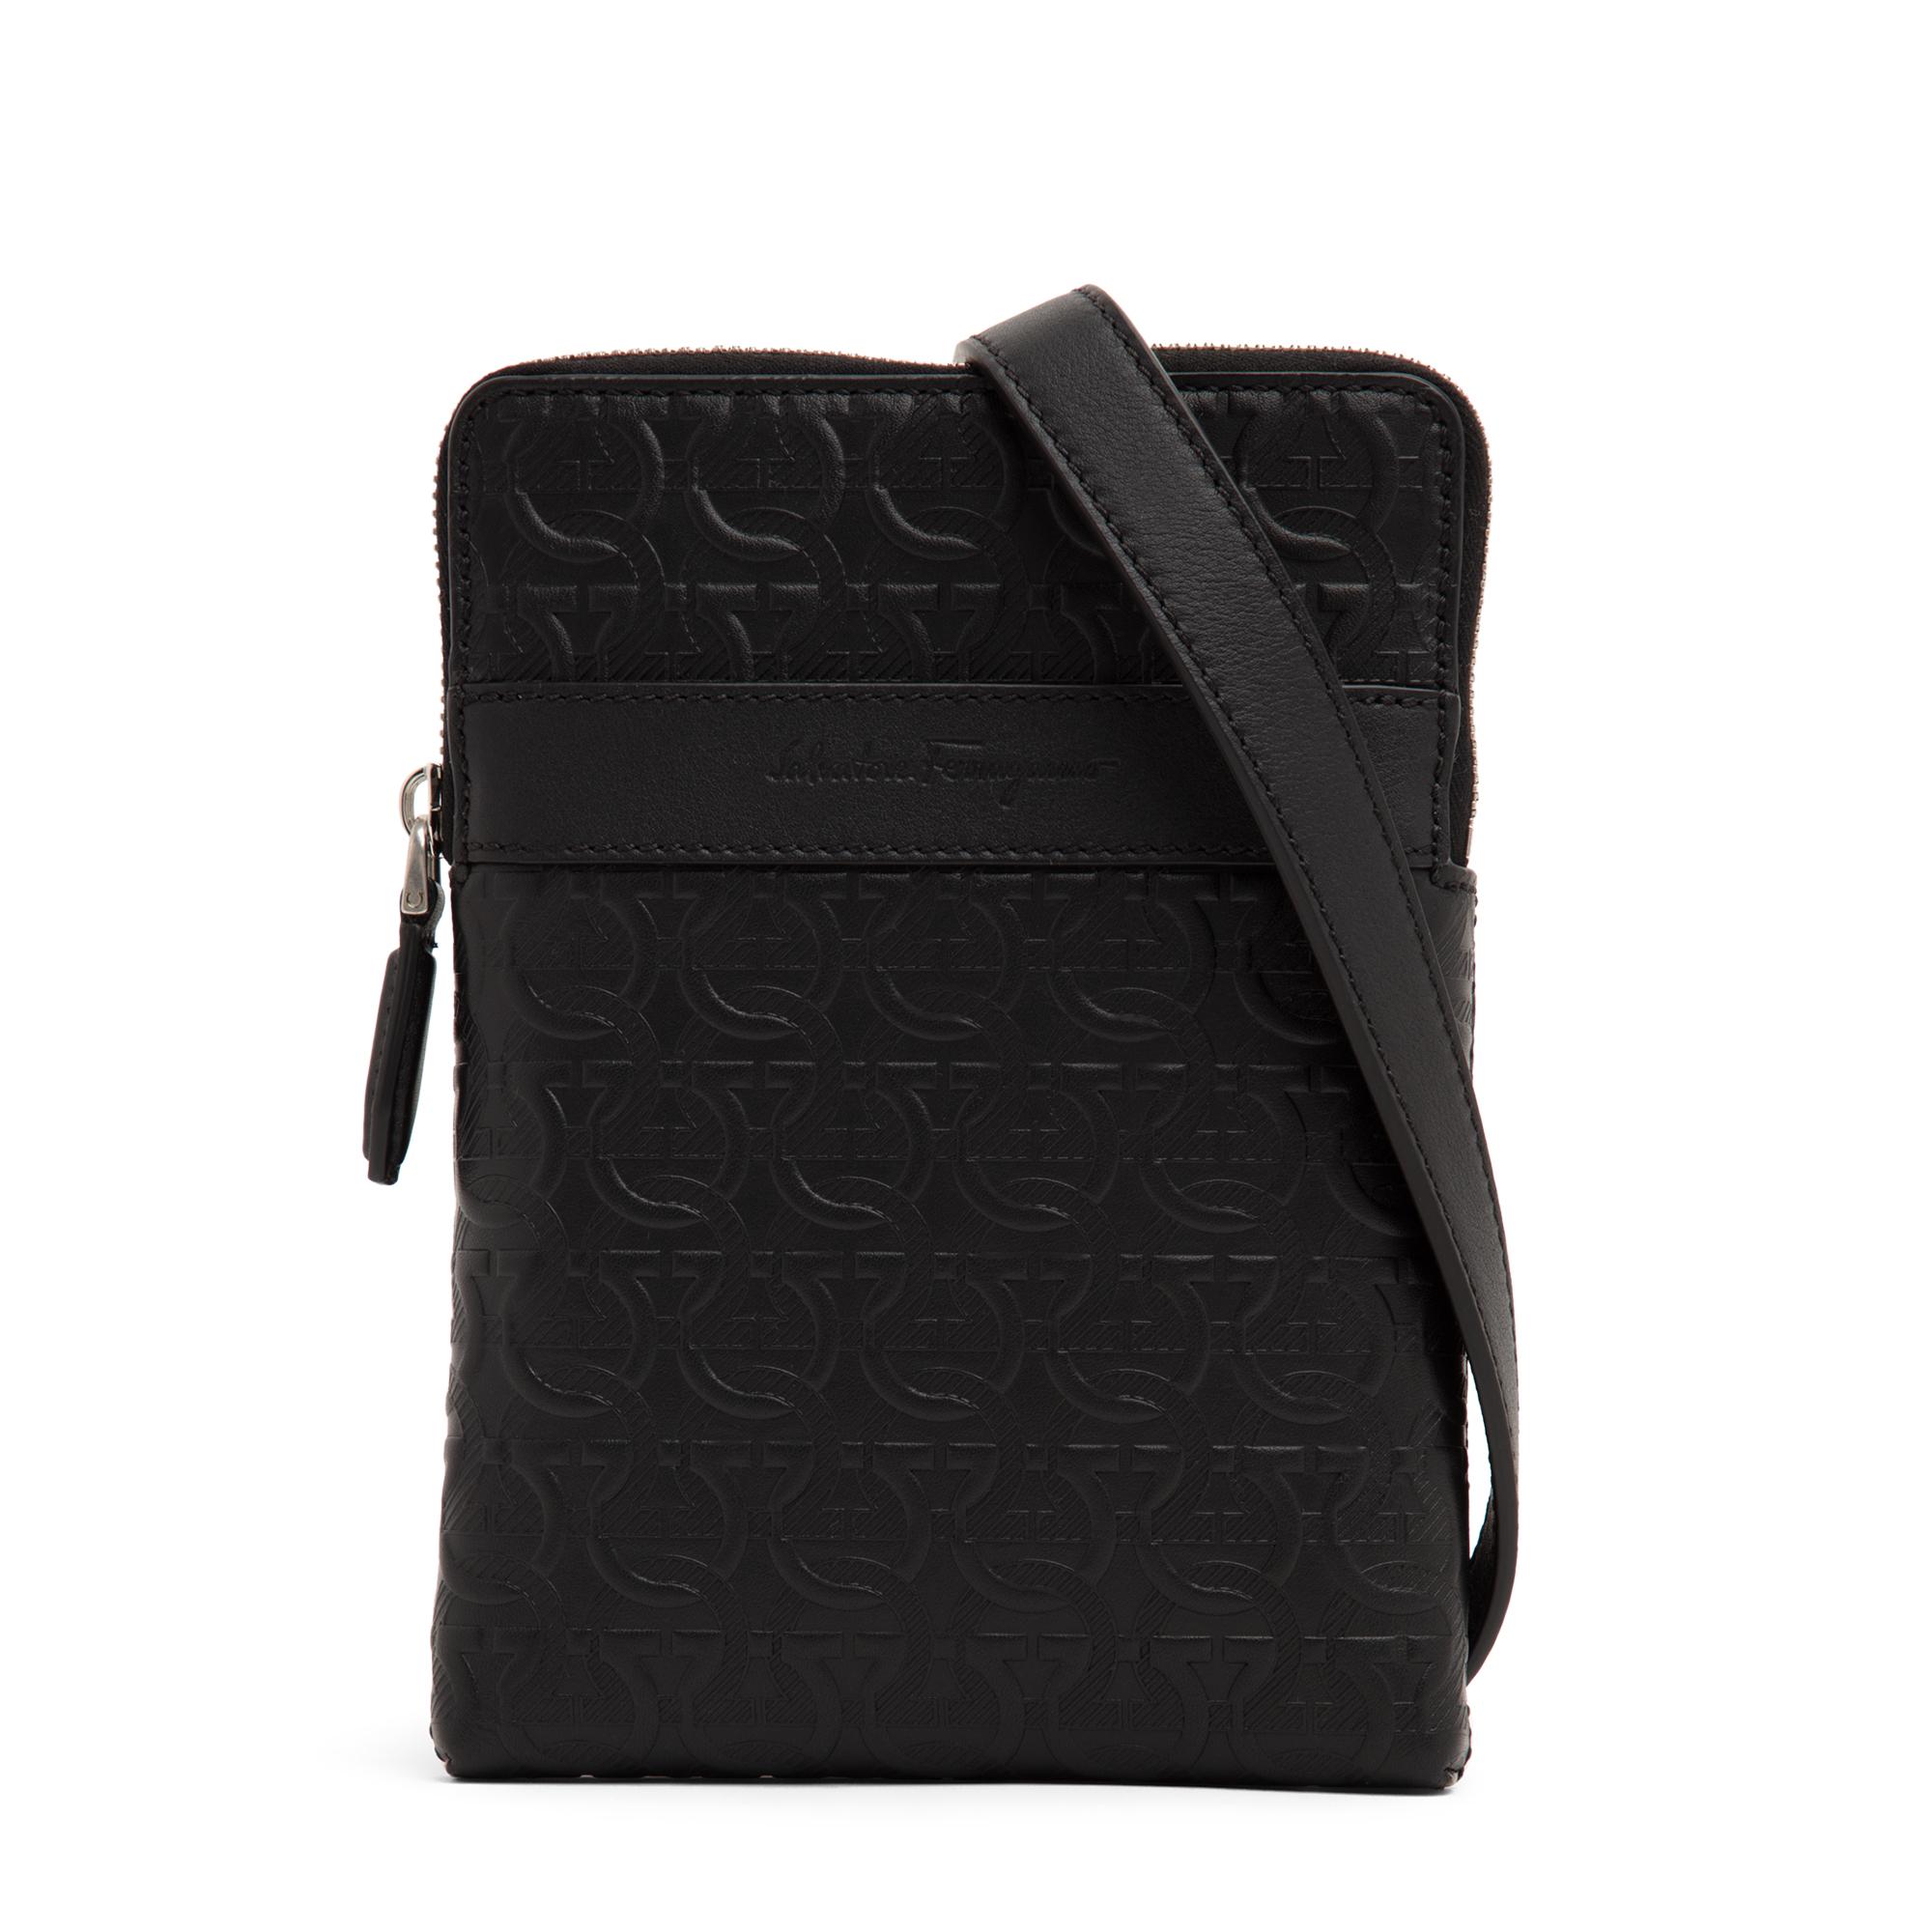 Gancini messenger bag